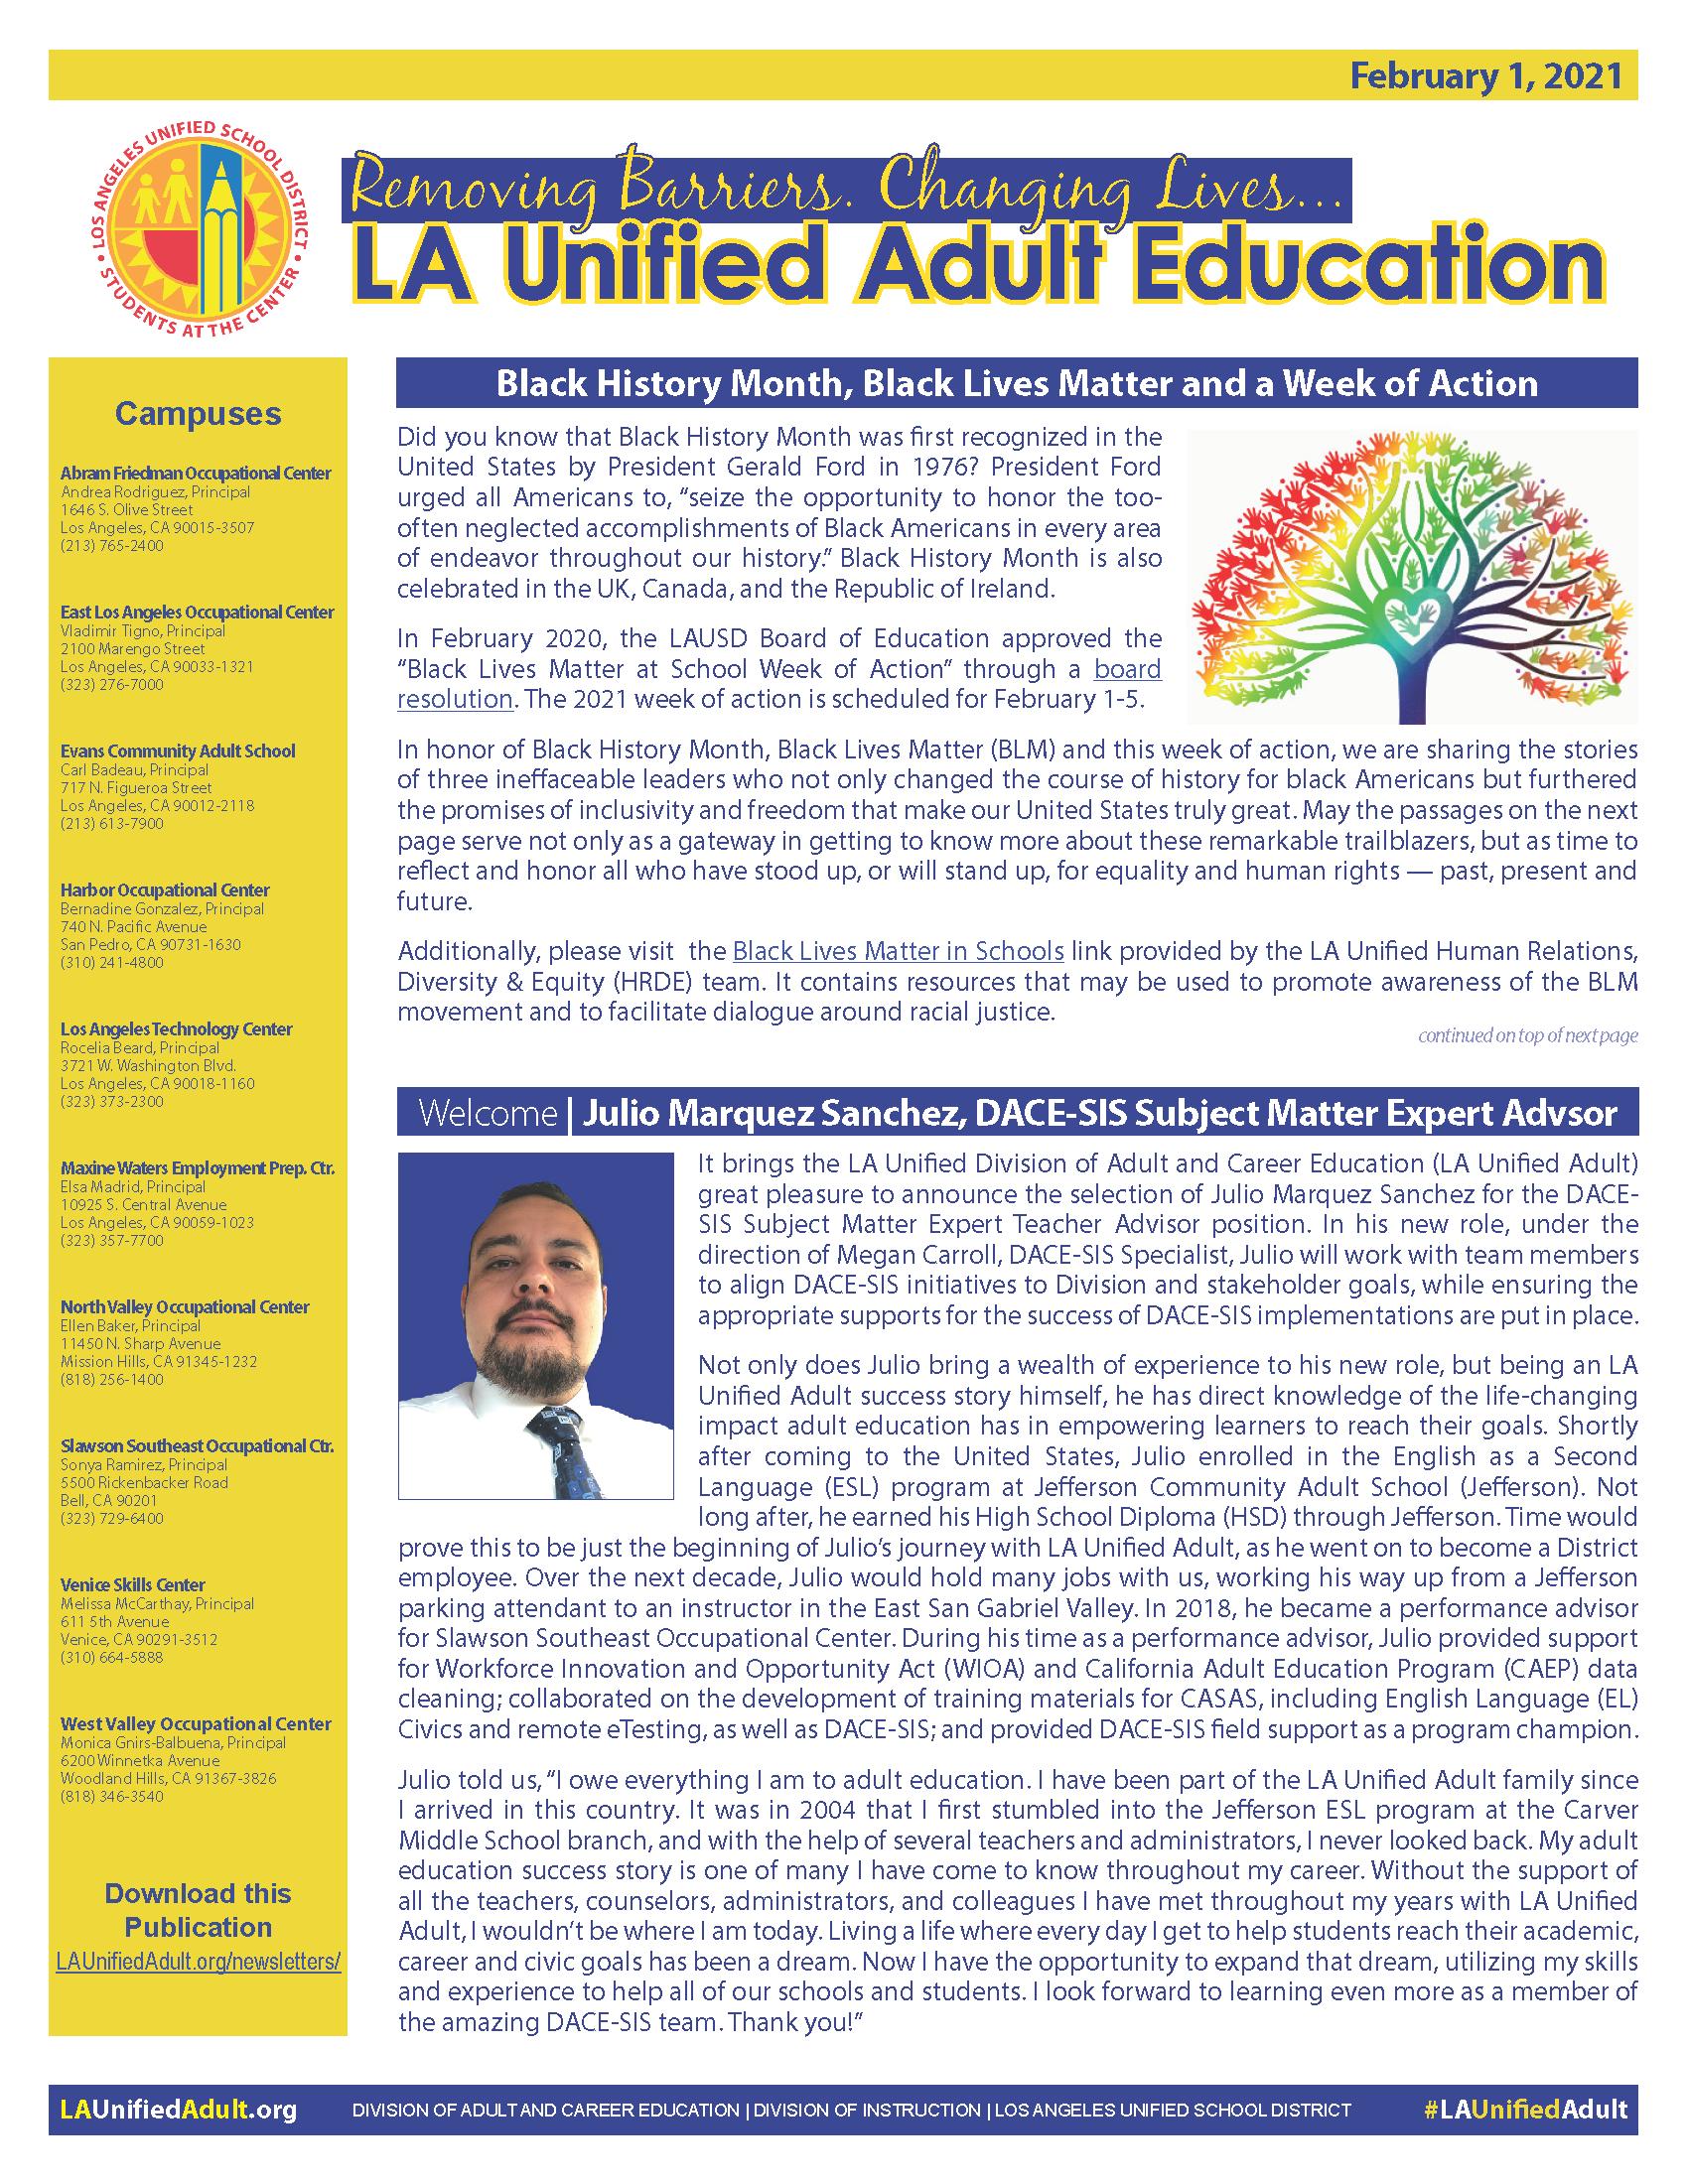 DACE Newsletter - February 1, 2021 Thumbnail